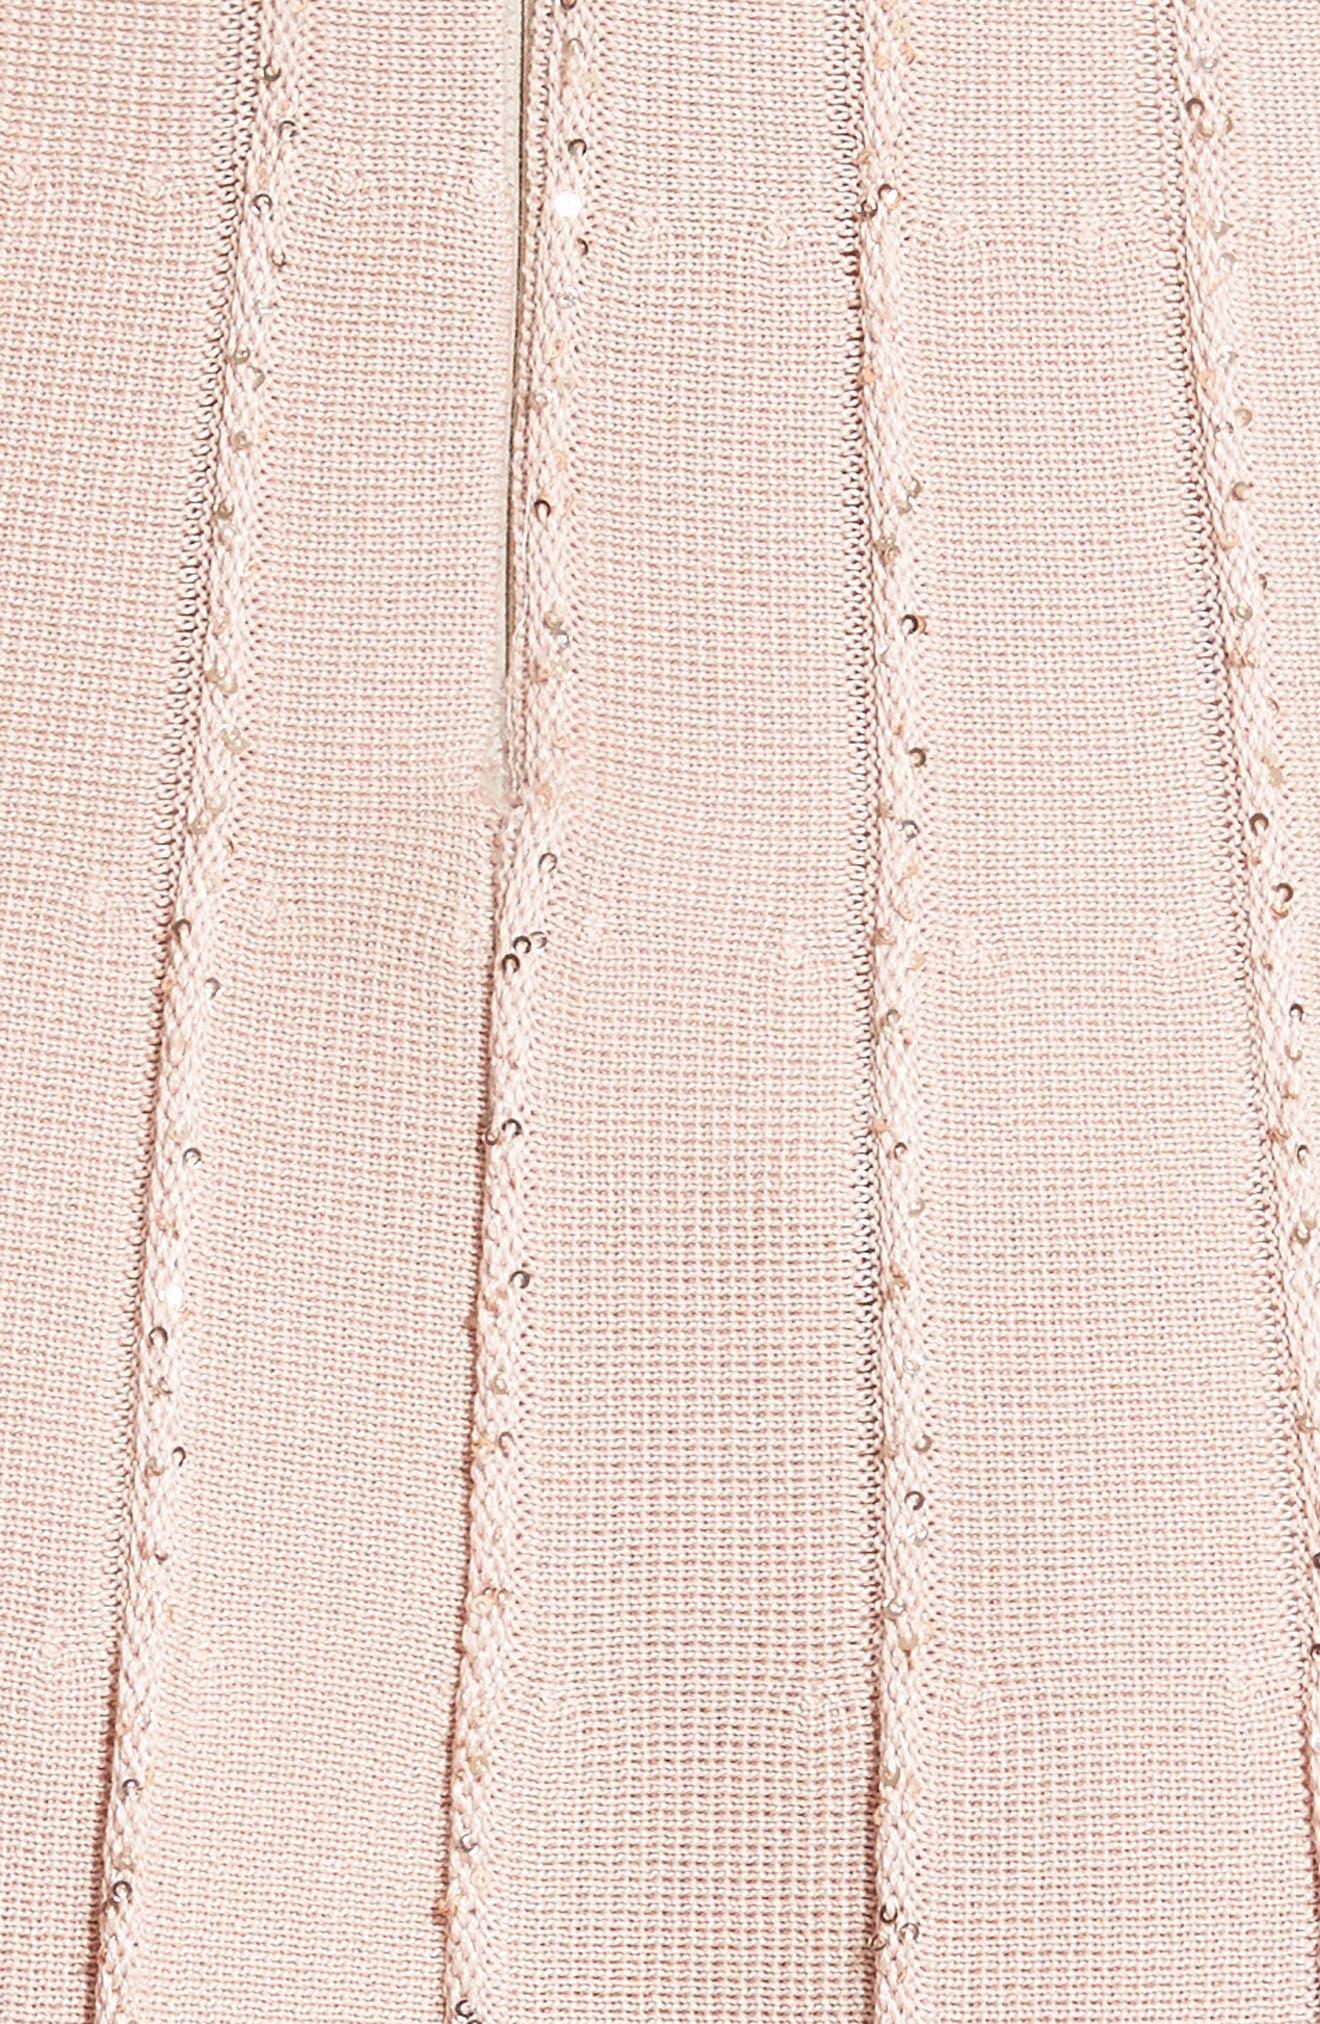 Sparkle Knit Pleated Dress,                             Alternate thumbnail 6, color,                             650